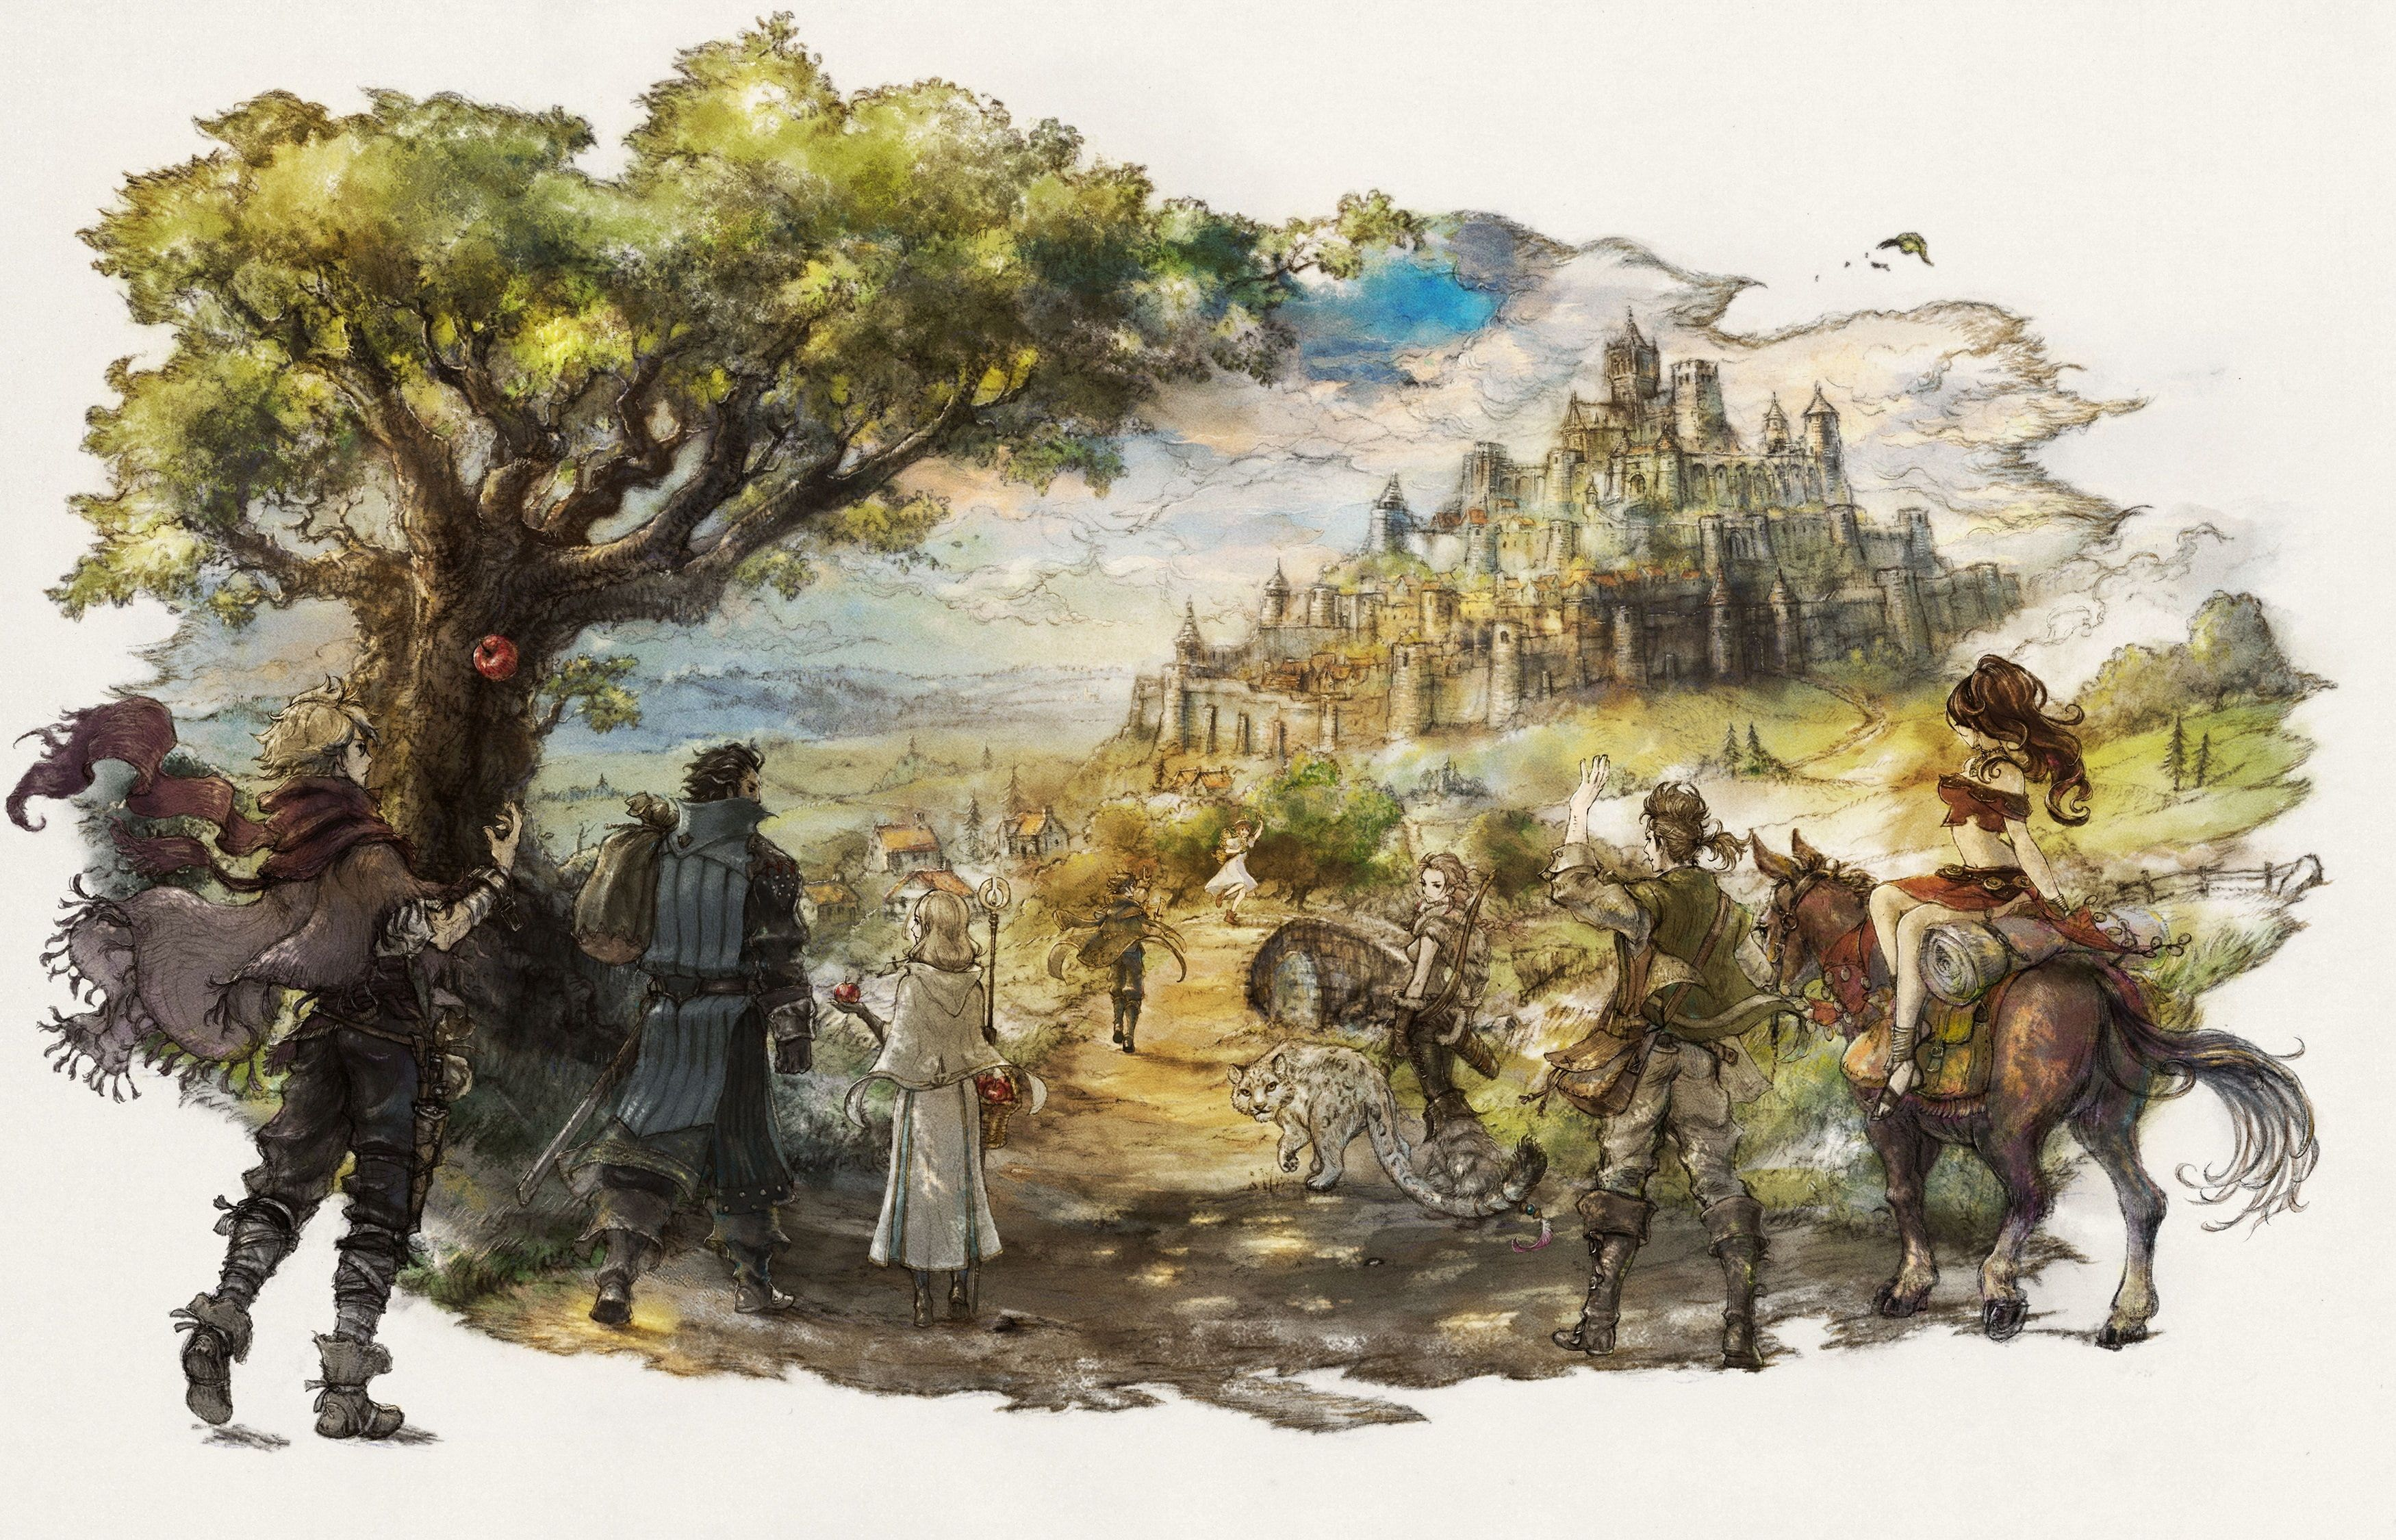 Octopath Traveler Video Games Fantasy Art Fantasy City Octopath Traveler Traveler Wallpaper Fantasy City